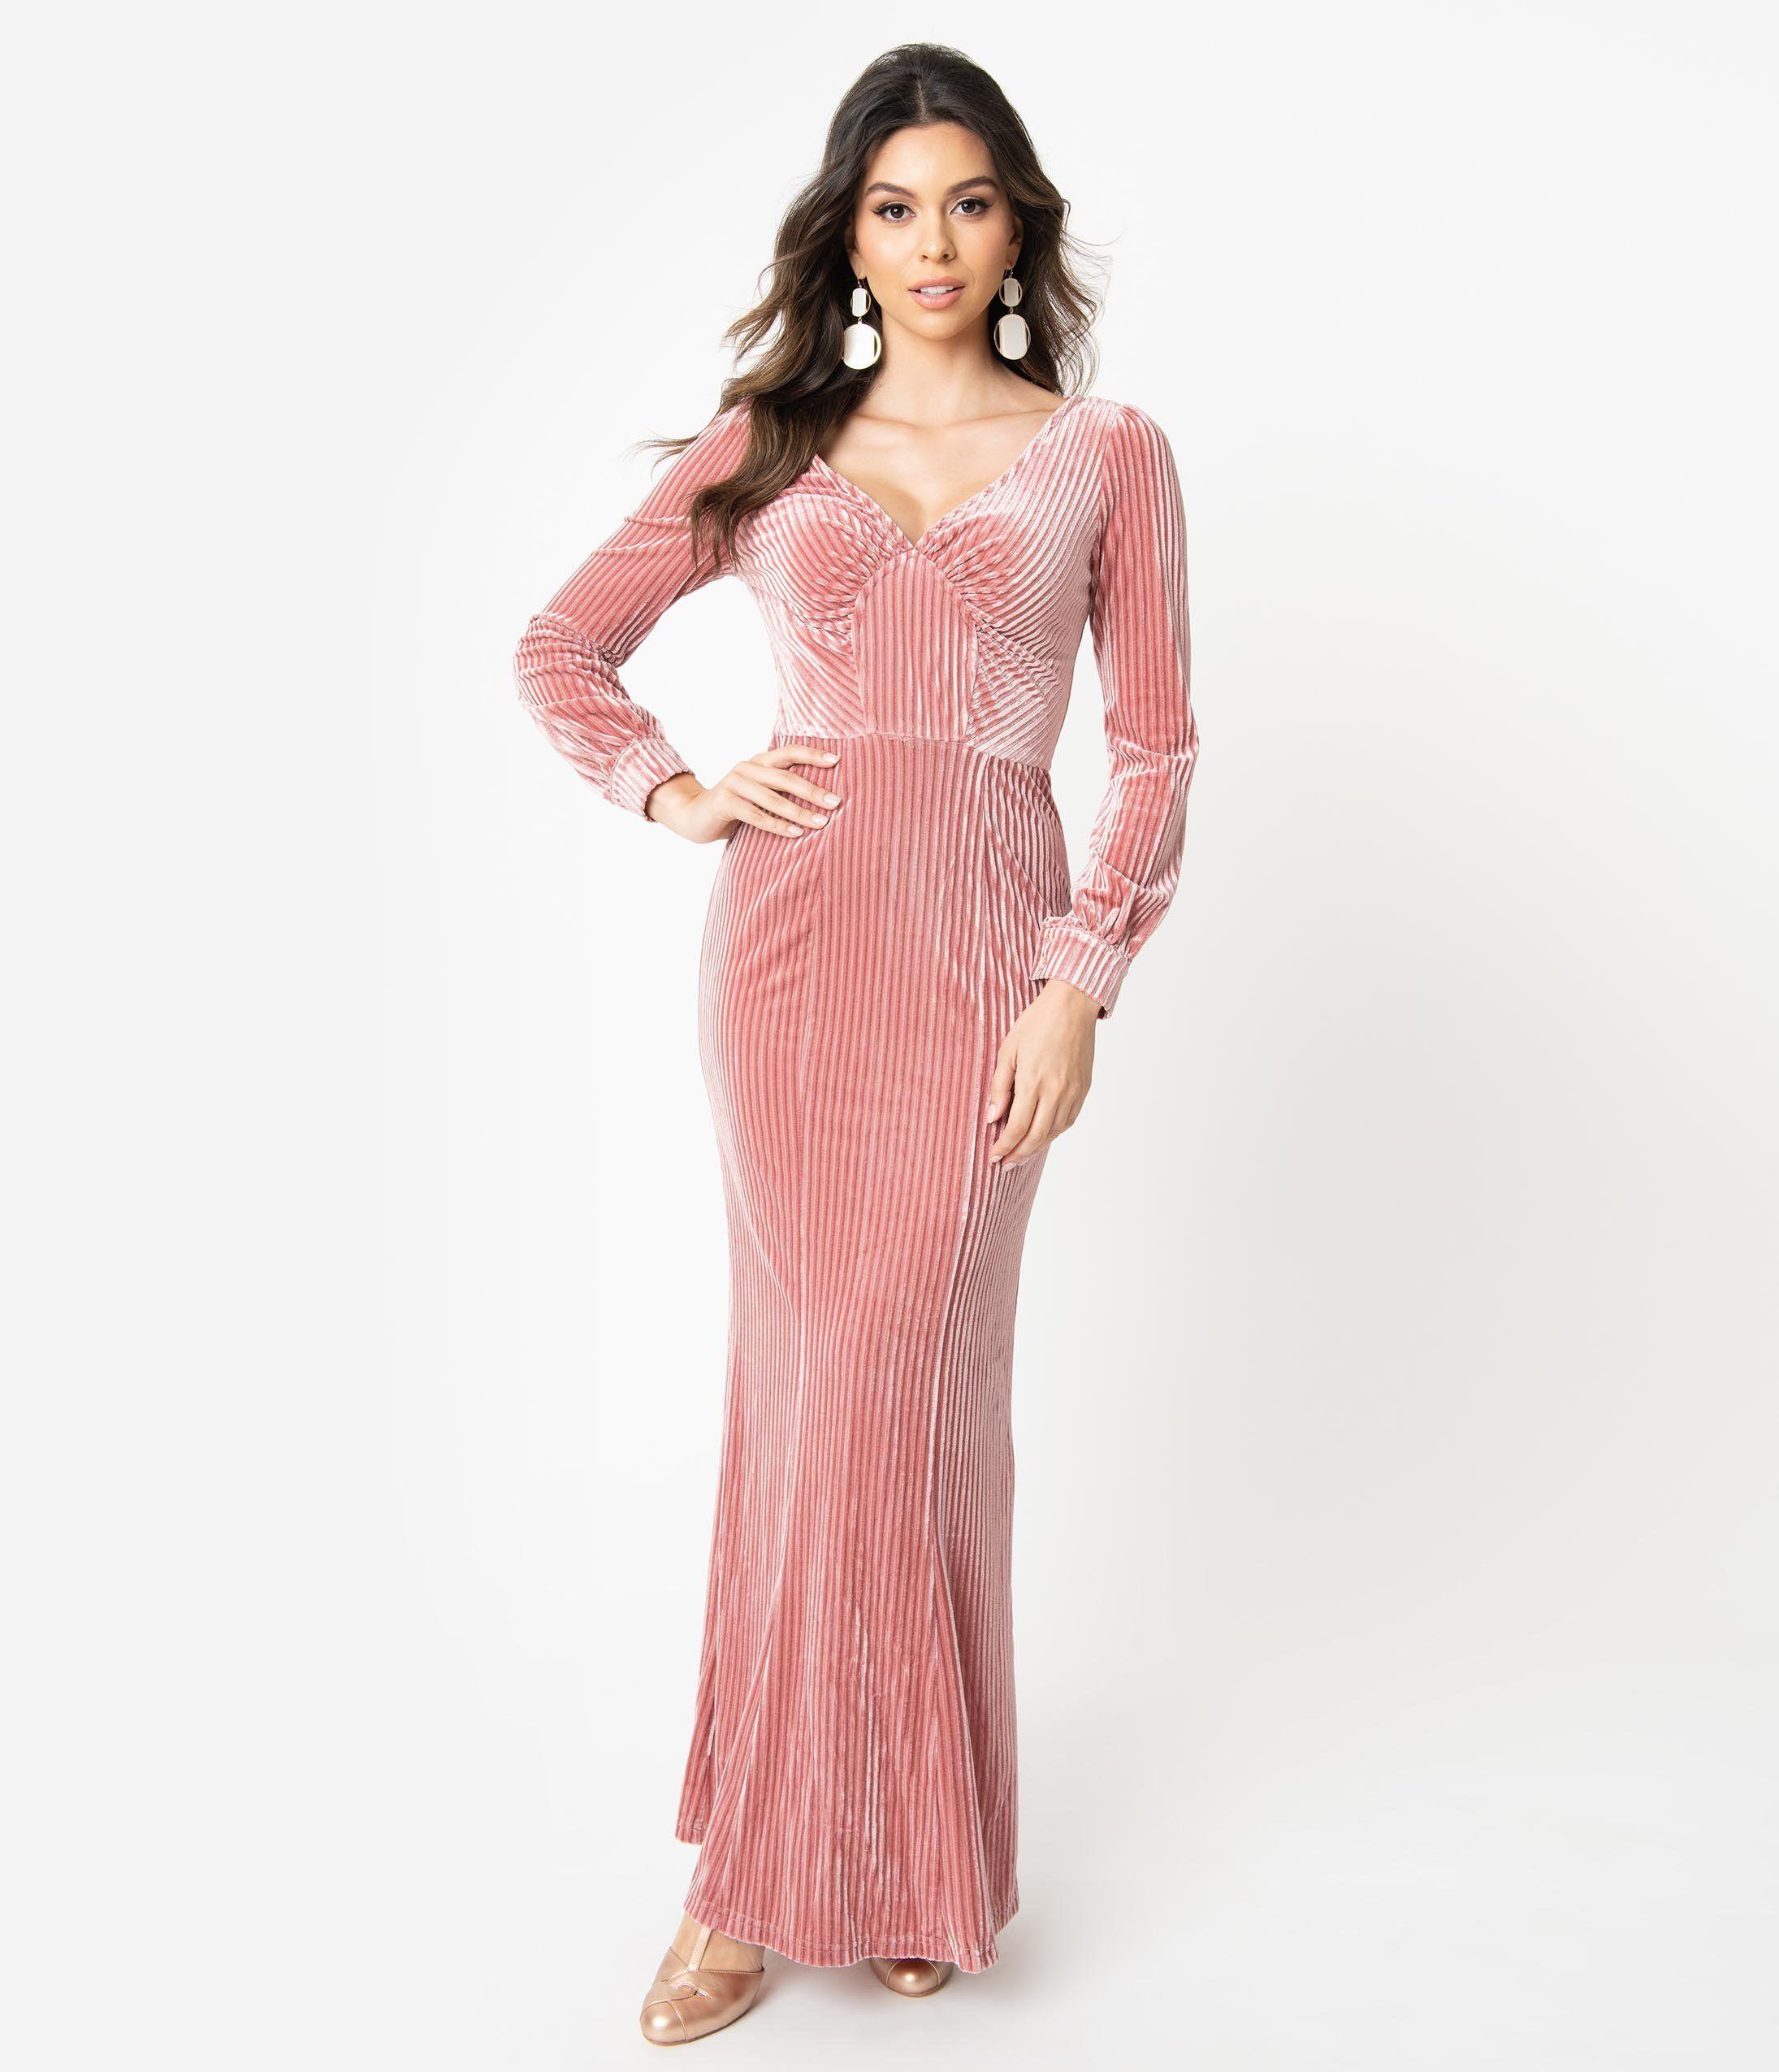 1930s Evening Dress Art Deco Gown Party Dress Long Sleeve Maxi Dress Maxi Dress With Sleeves Pink Velvet Dress [ 2550 x 2190 Pixel ]